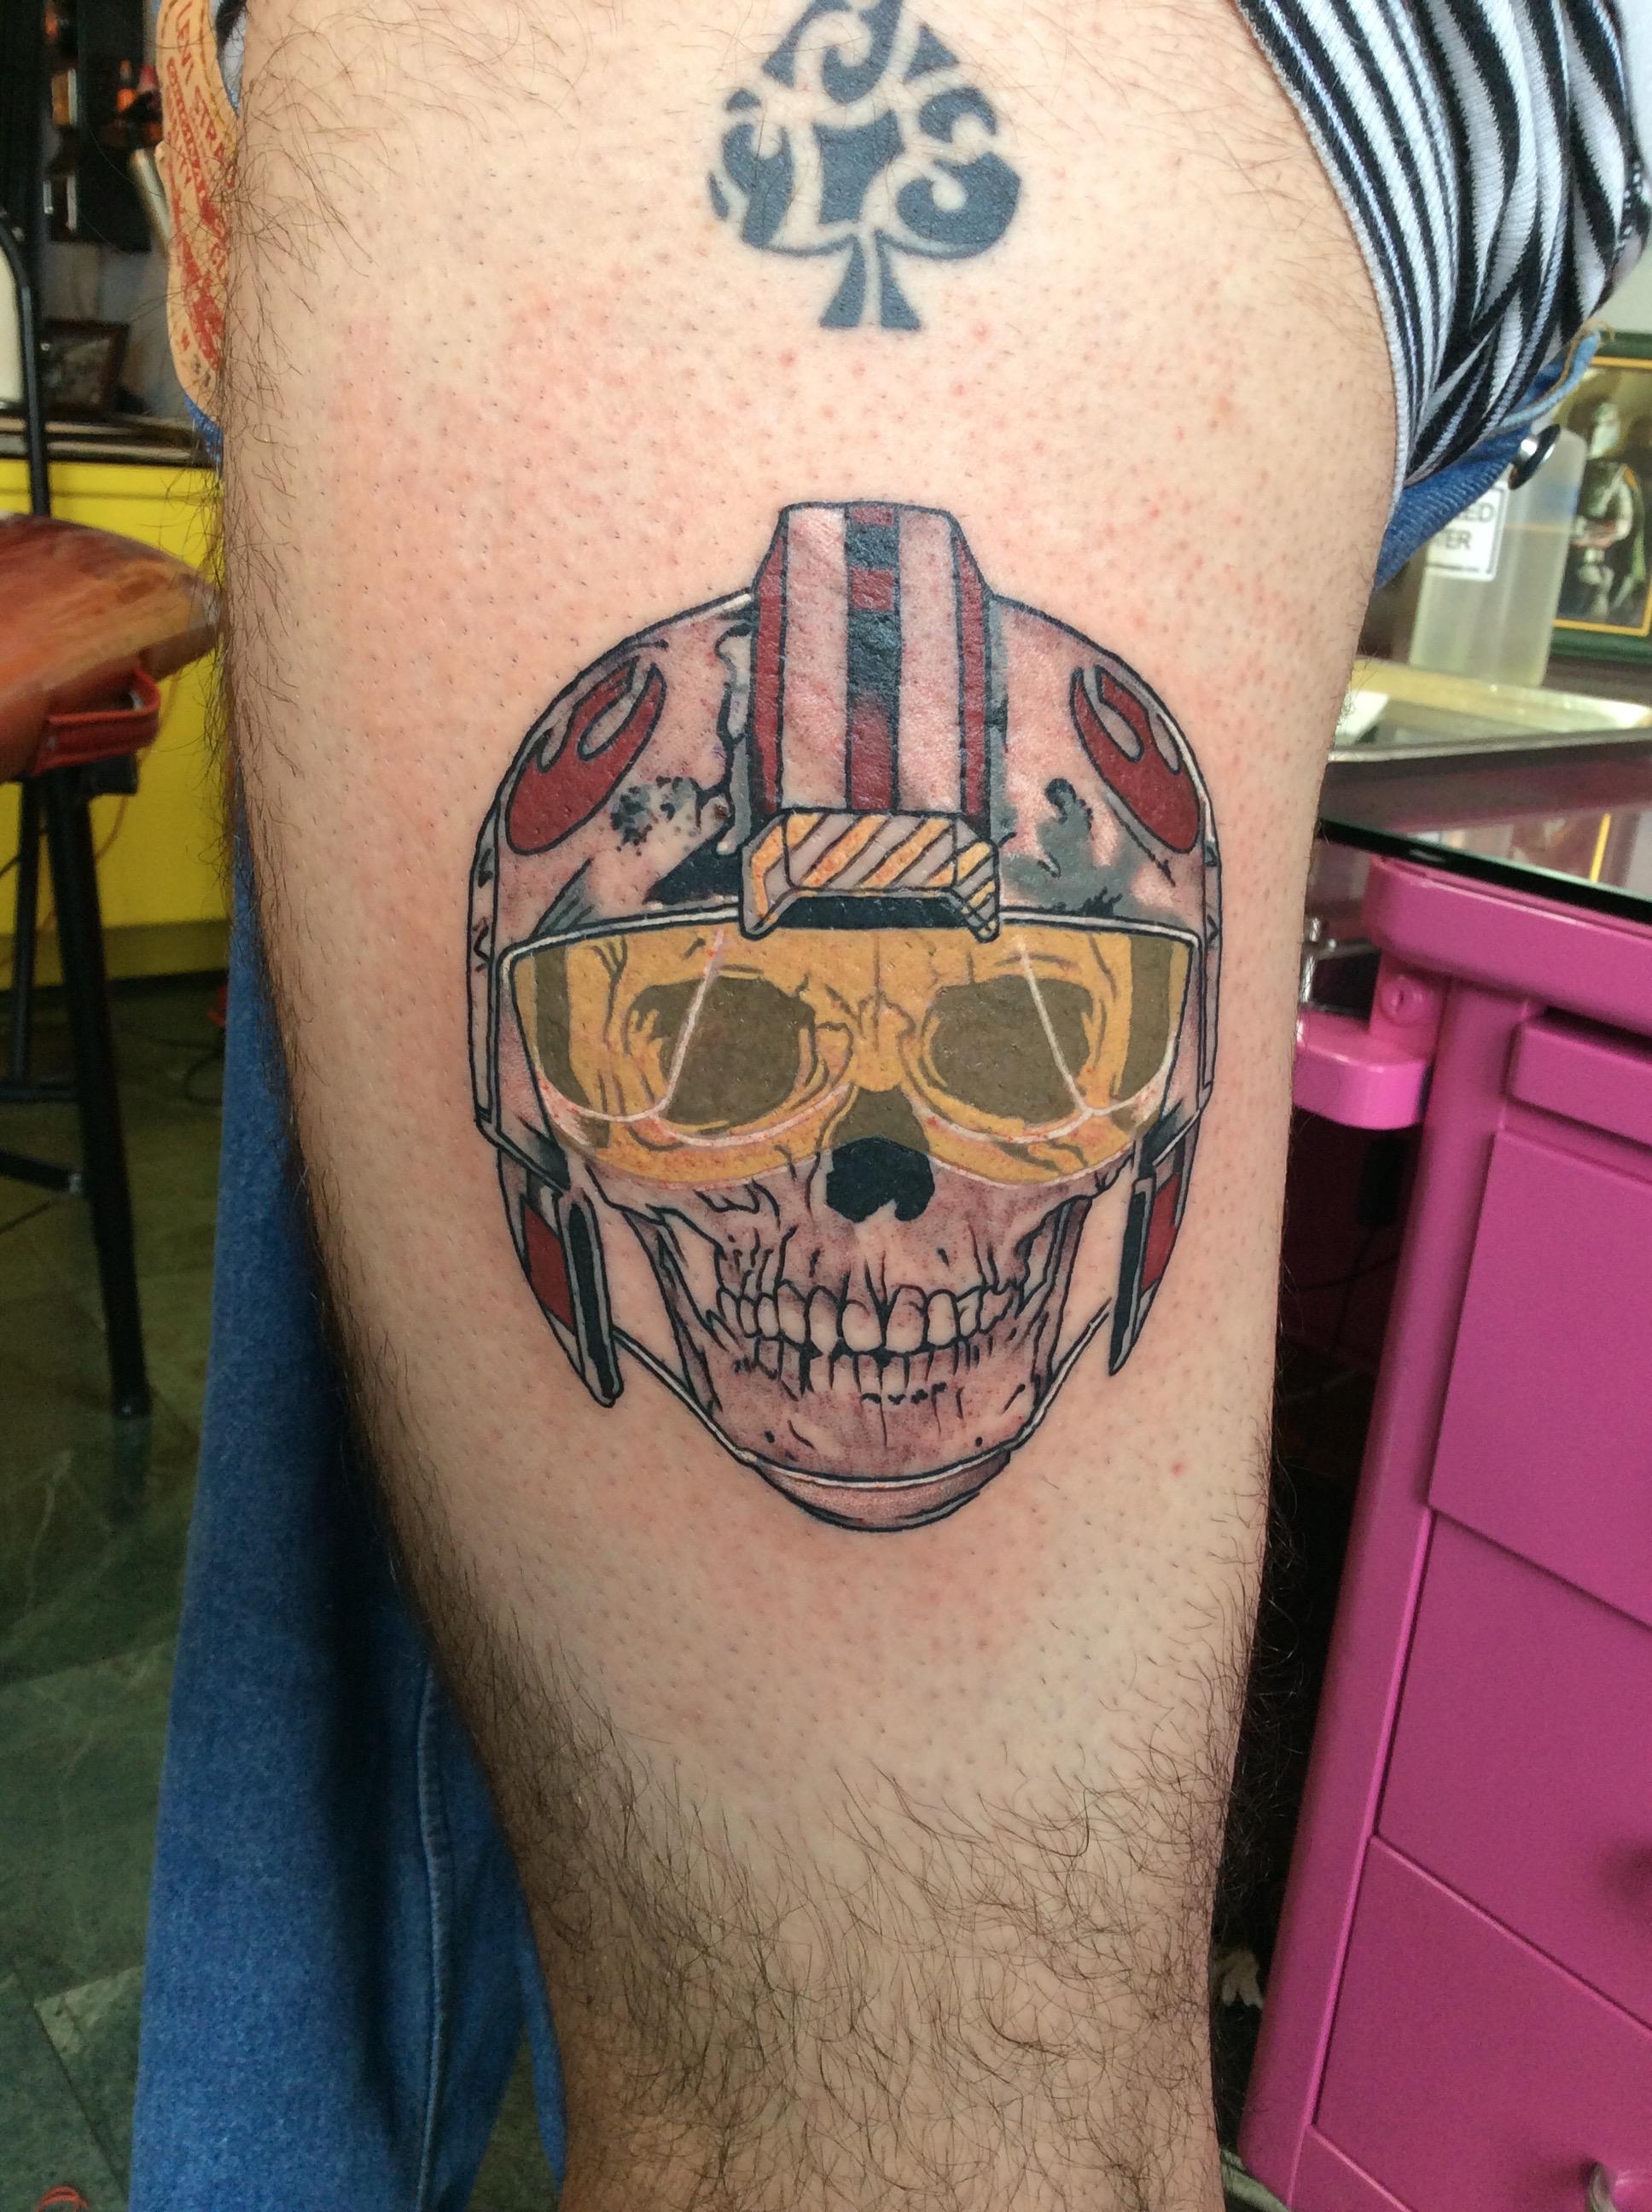 Star_wars_tattoo_skull.jpg